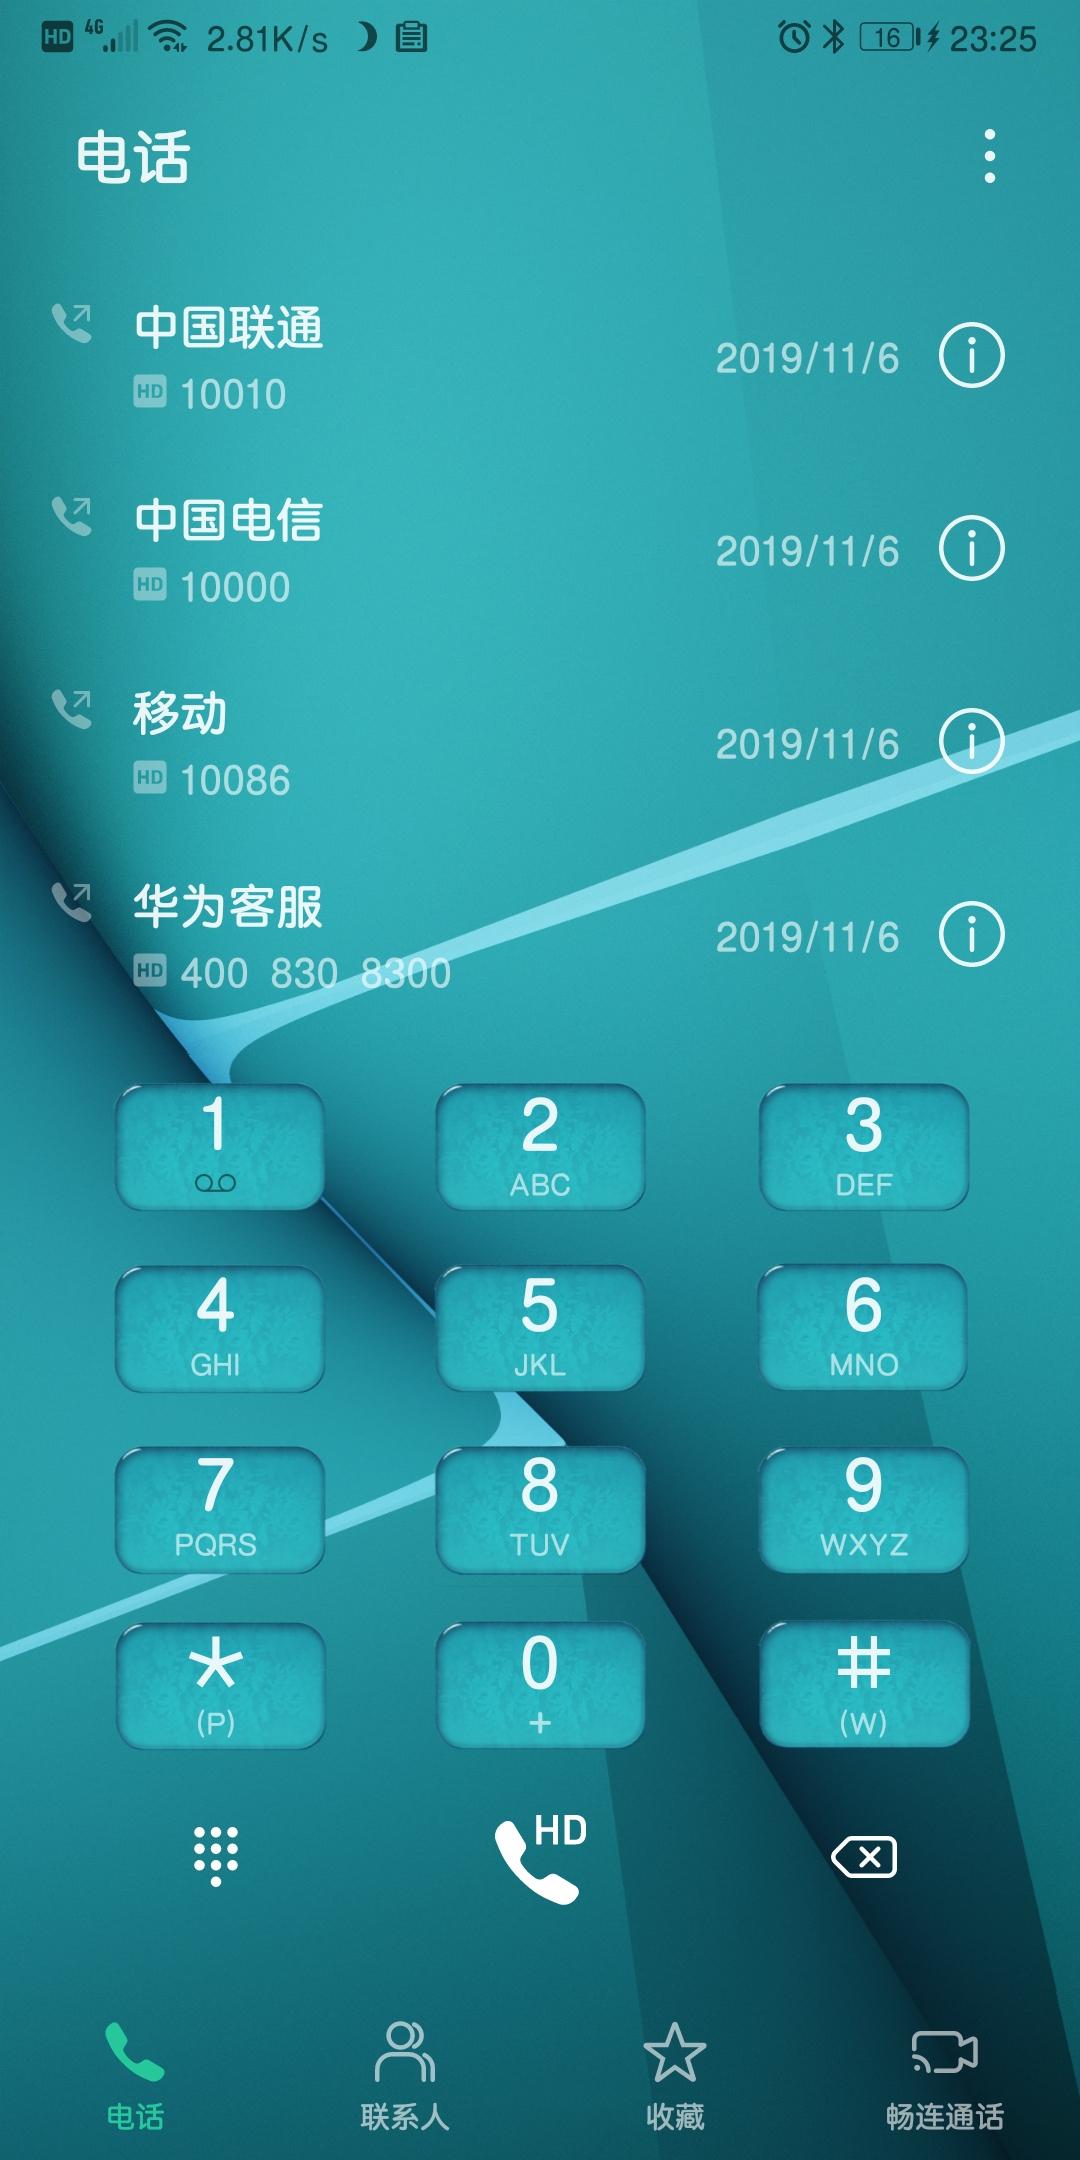 Screenshot_20200112_232548_com.android.contacts.jpg